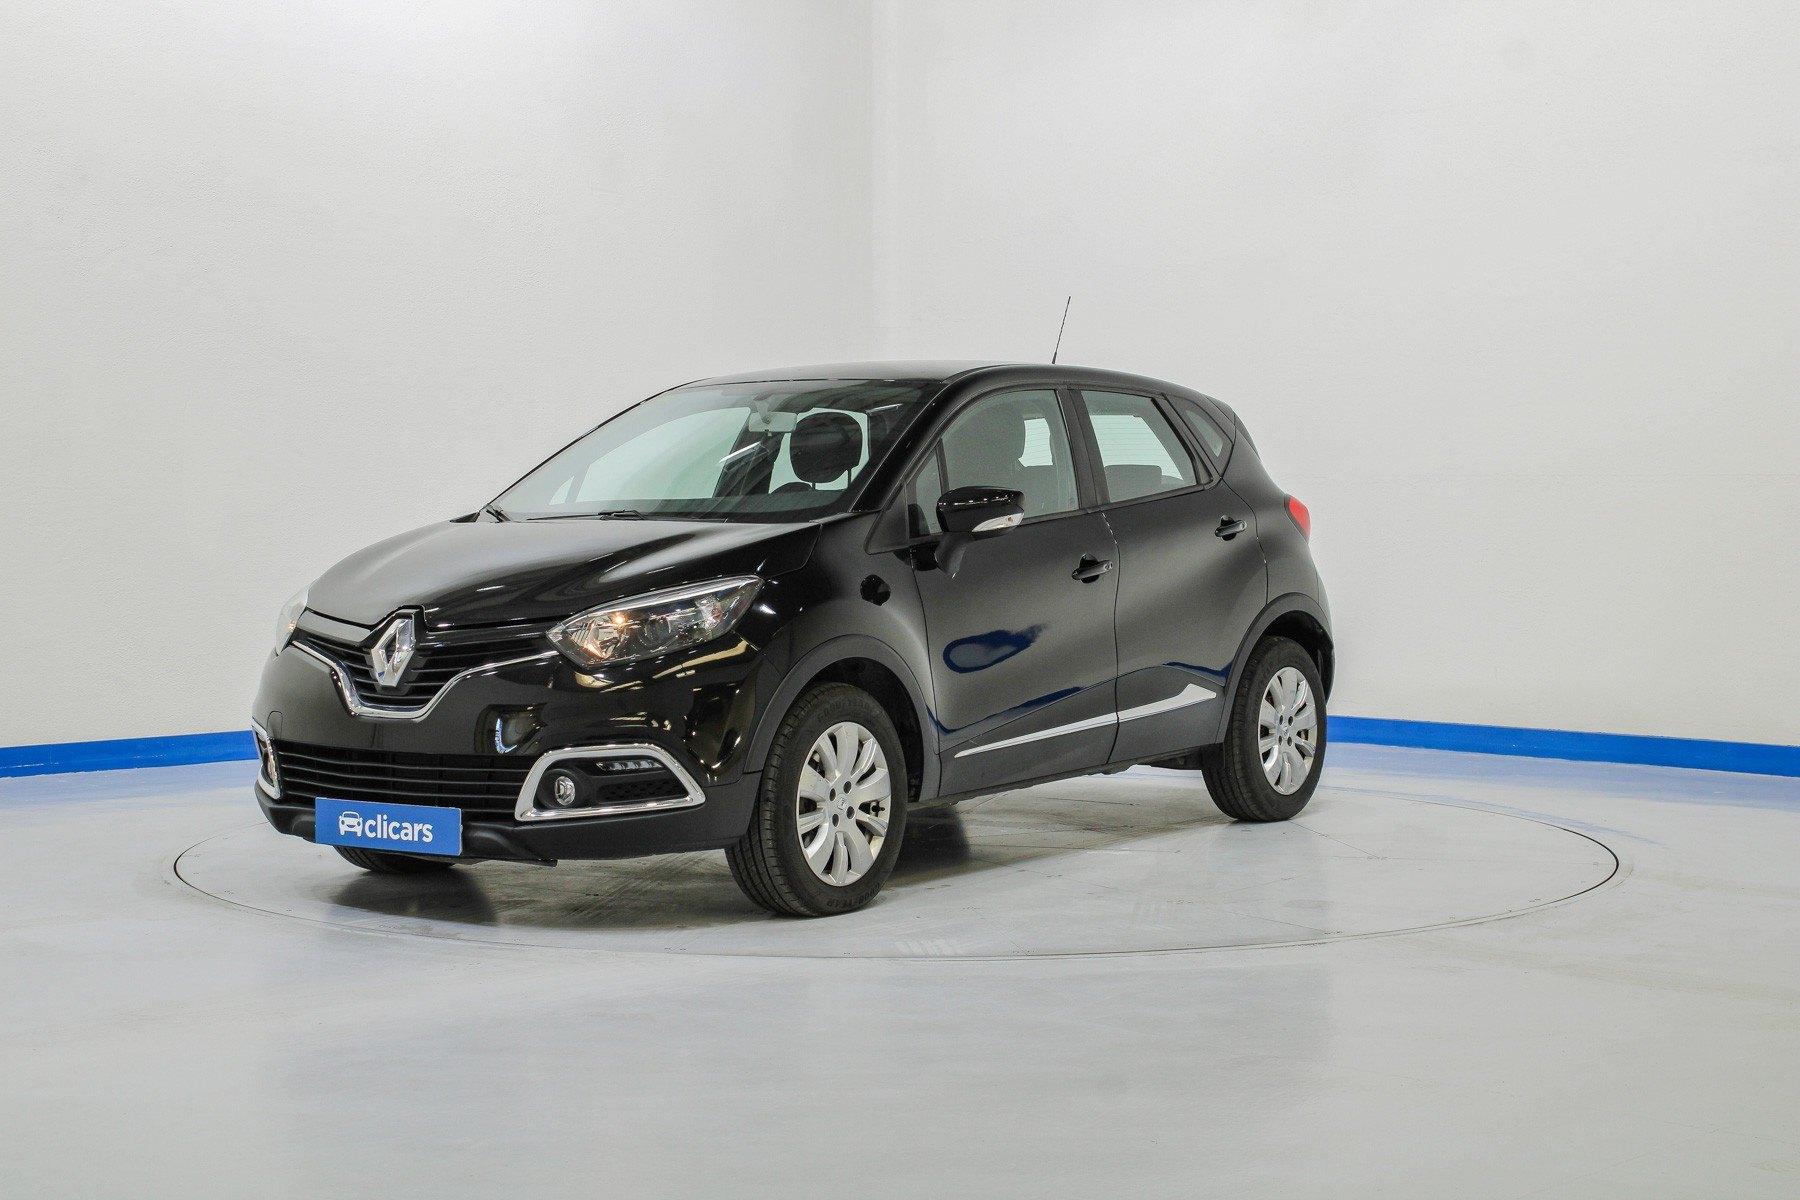 Renault Captur Diésel Intens Energy dCi 90 eco2 Euro 6 1